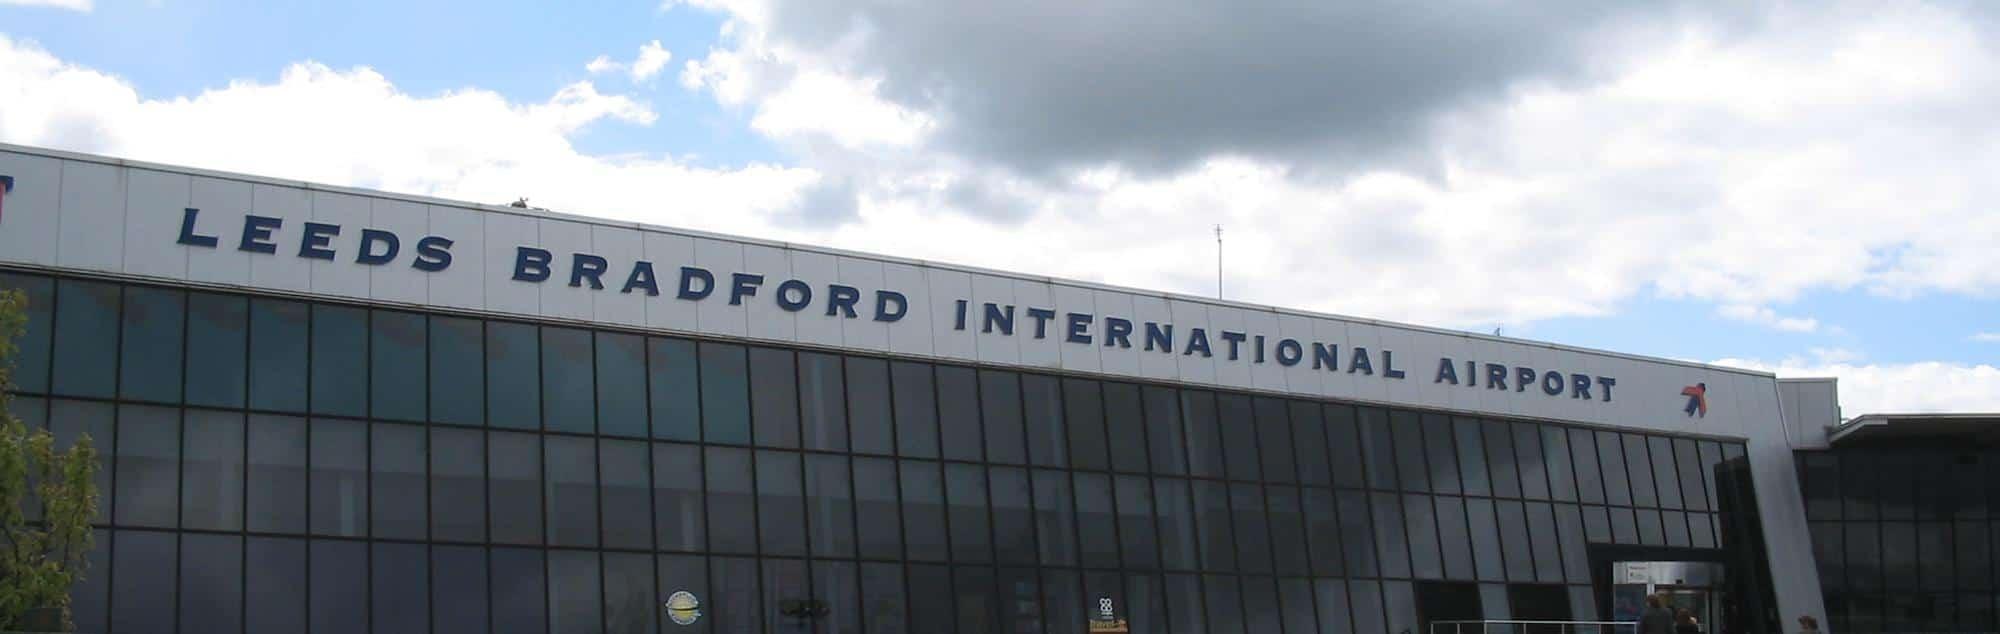 Airport transfer leeds bradford lba online booking airport leeds bradford lba m4hsunfo